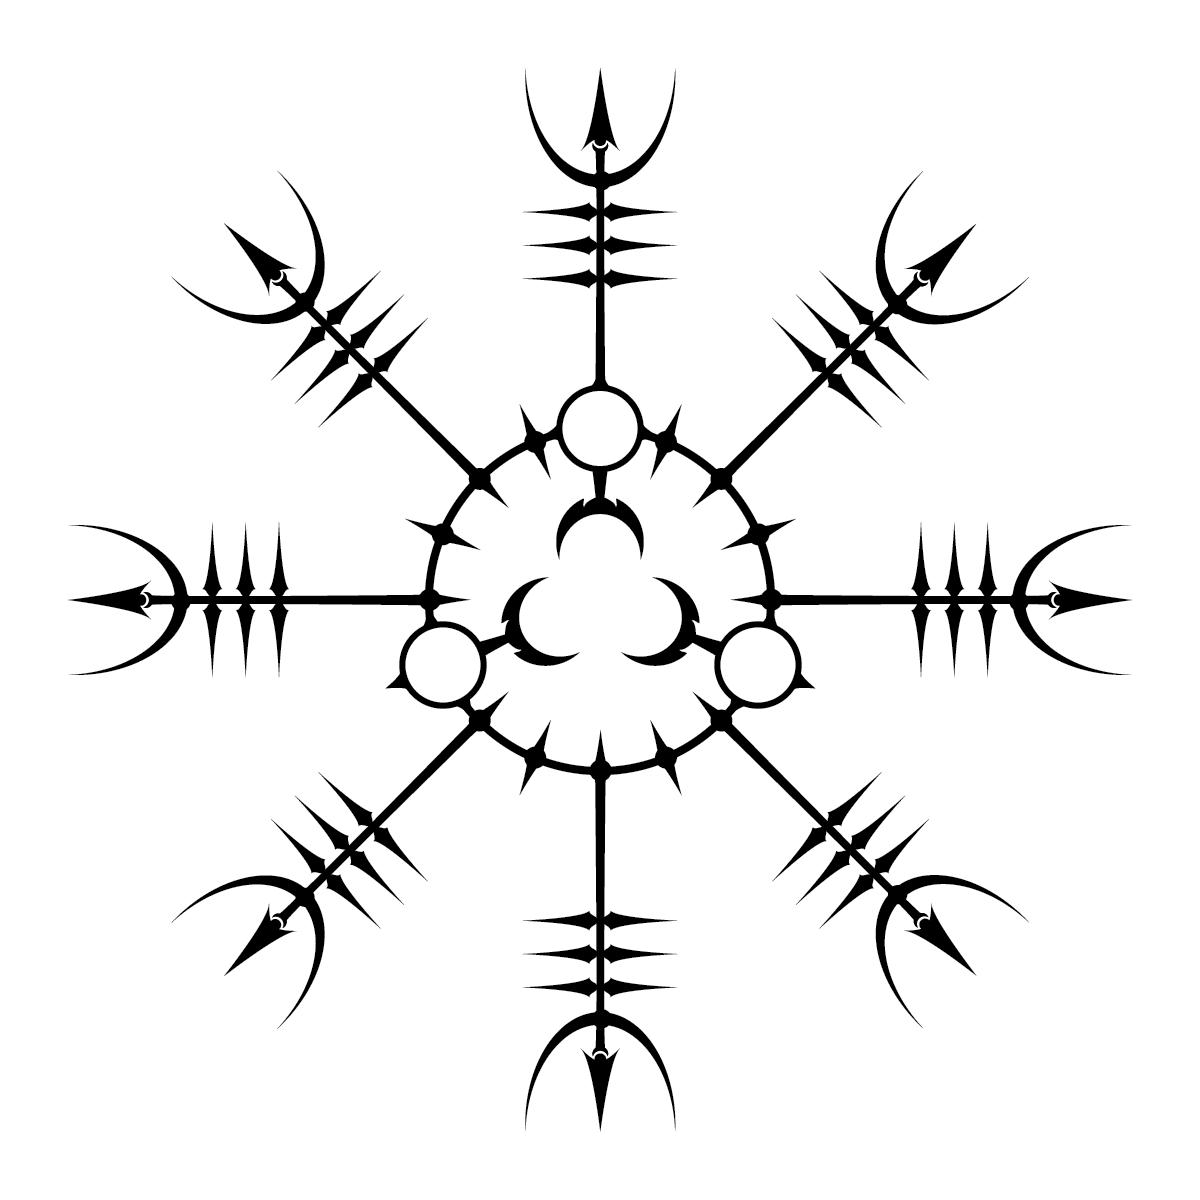 American Traditional Poseidon Tattoo Designs